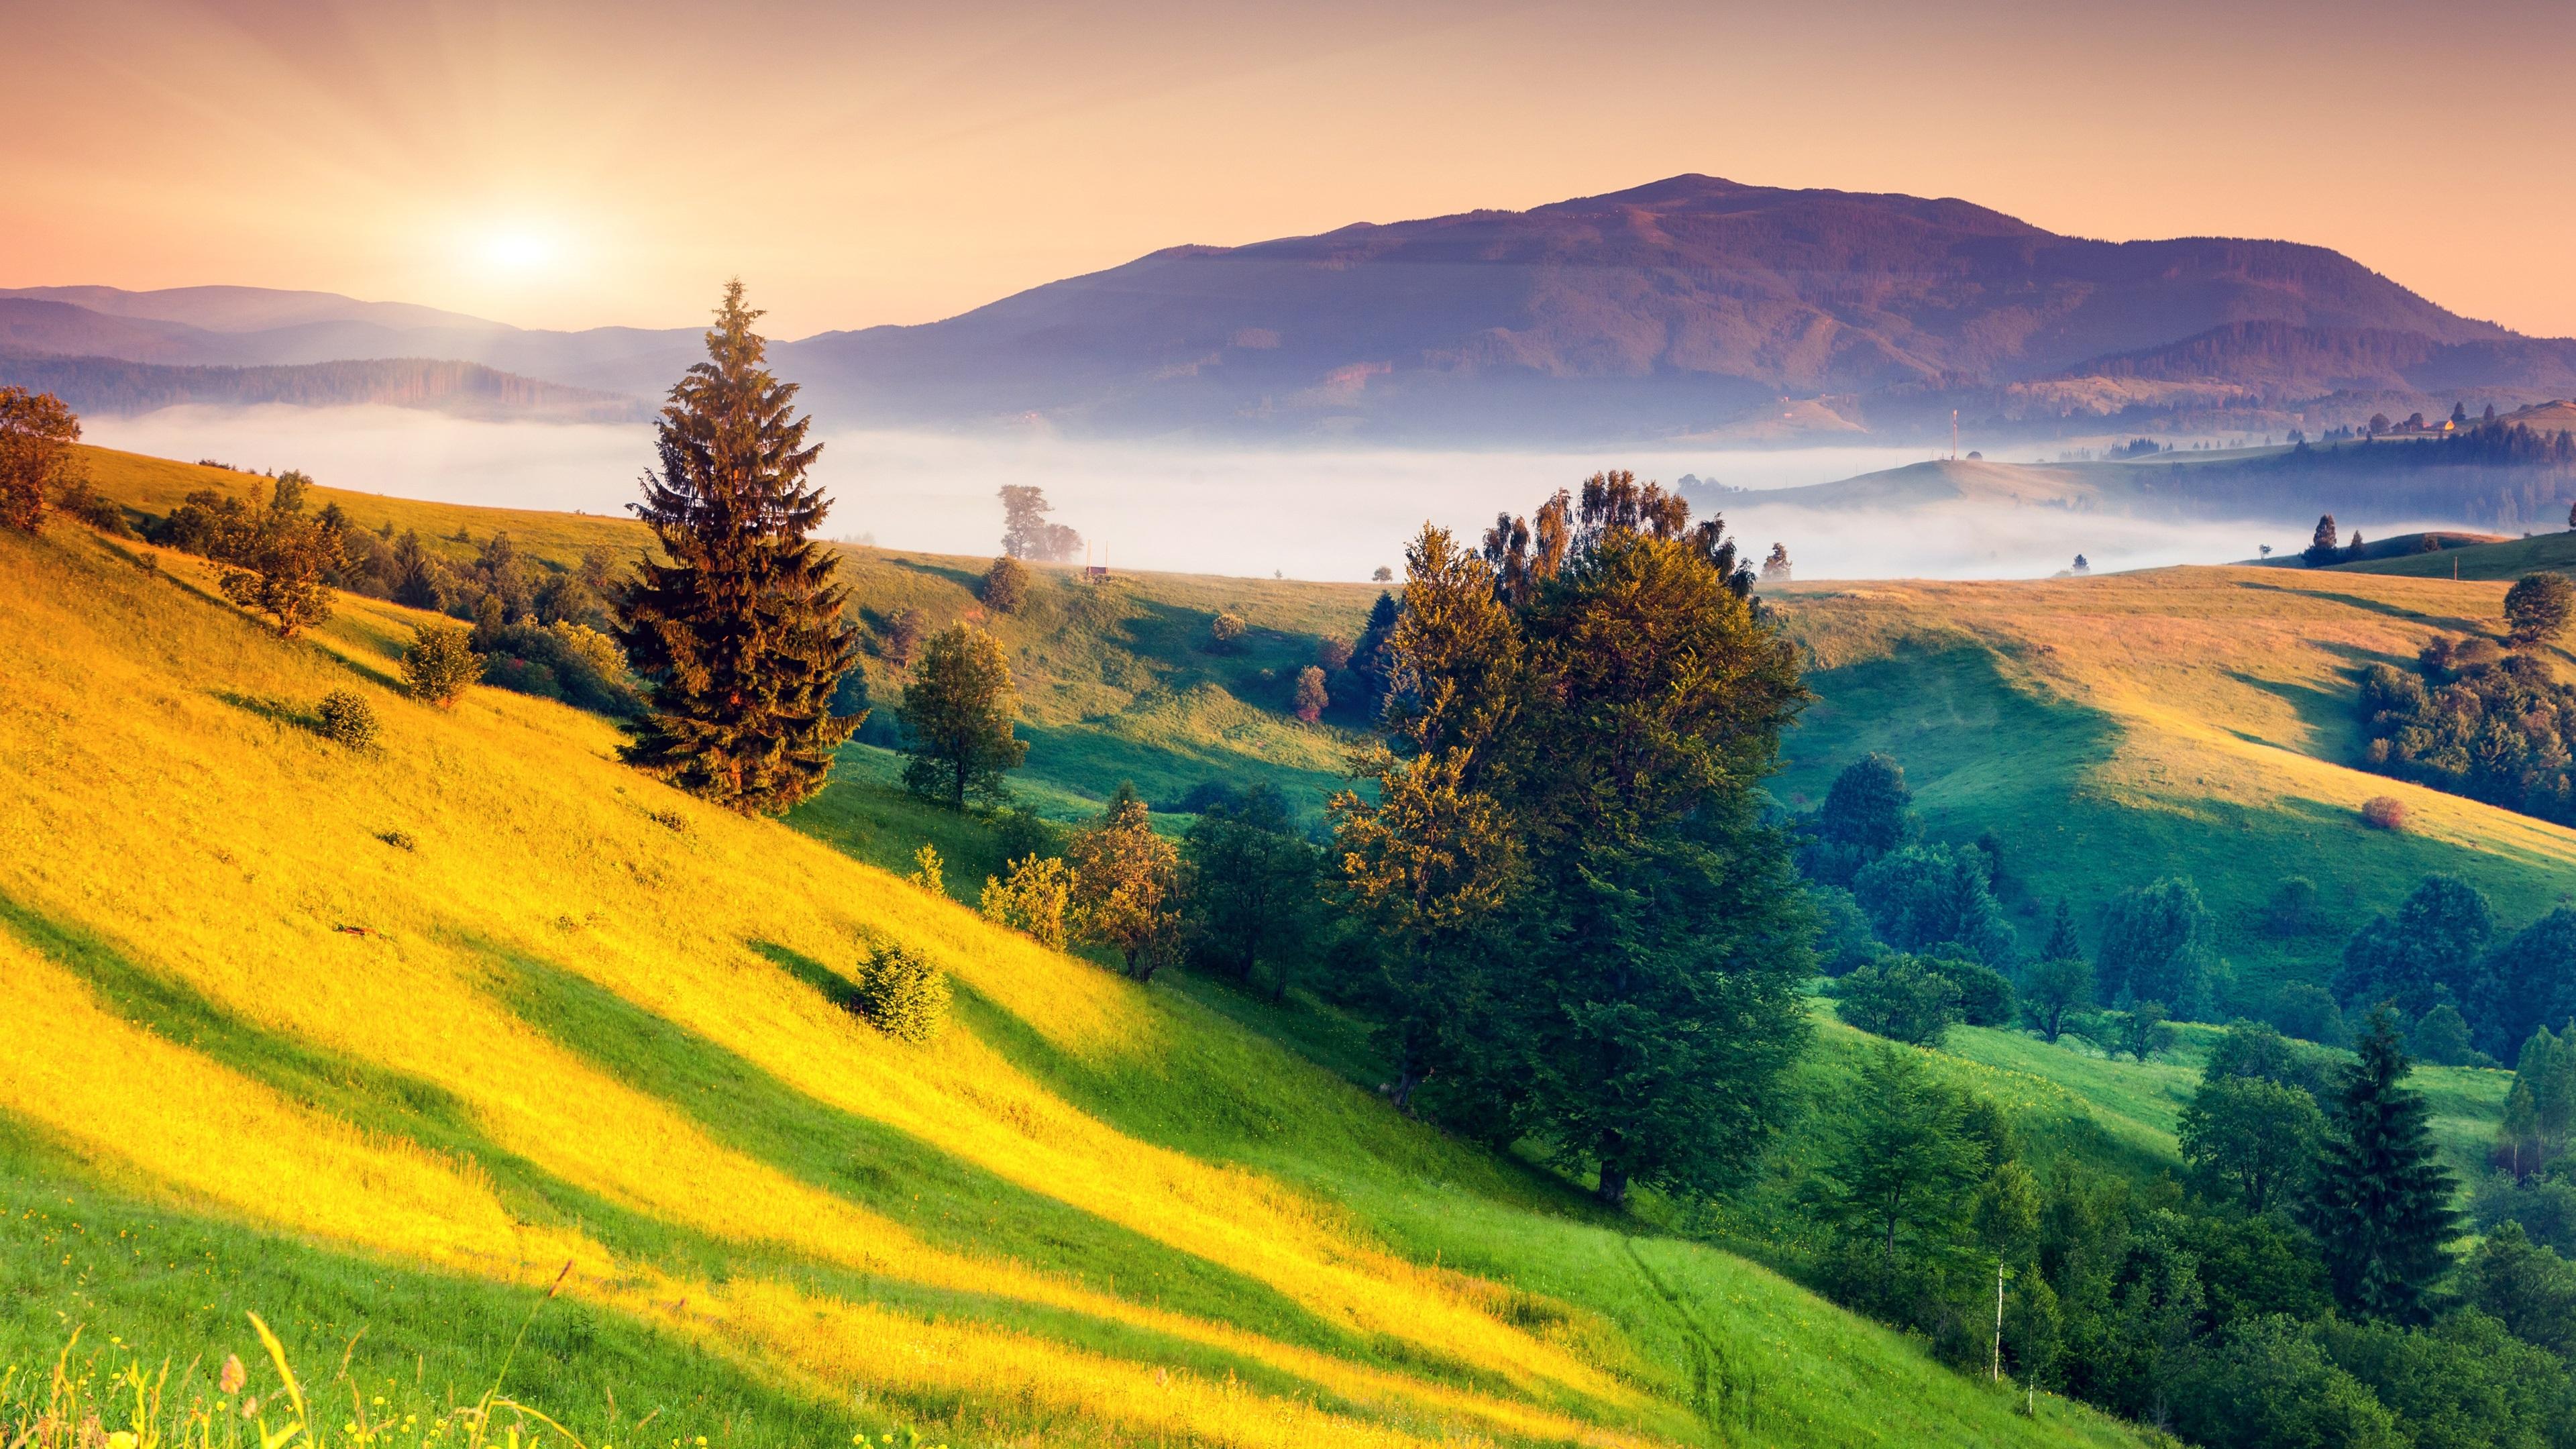 Download Wallpaper 3840x2160 Beautiful nature landscape ...